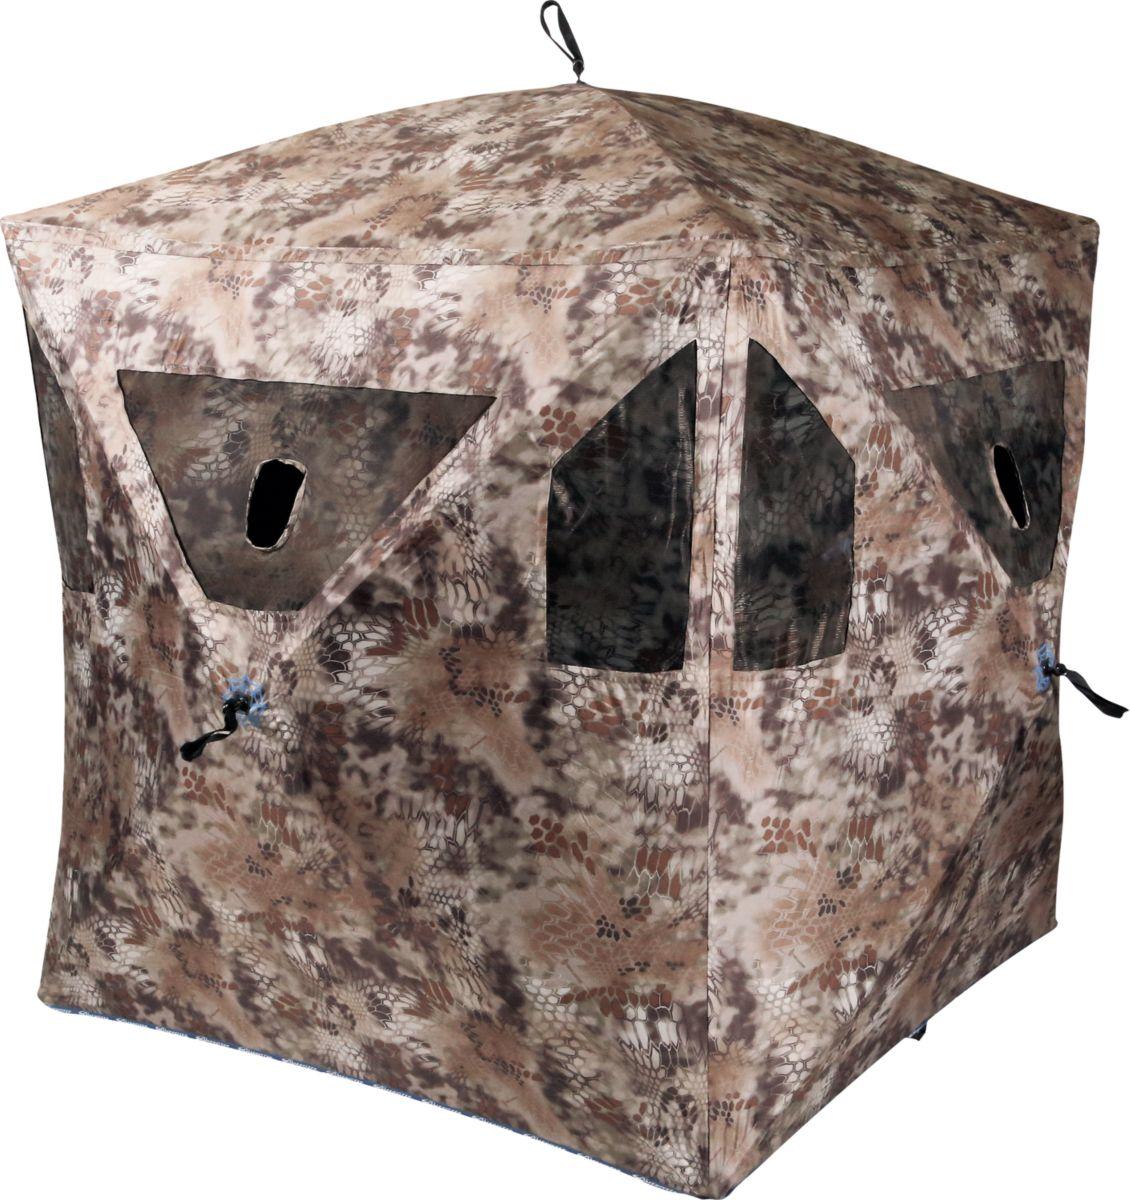 Ameristep Battlefield Ground Blind Kryptek Highlander - $89 99 (Free 2-Day  Shipping over $50)